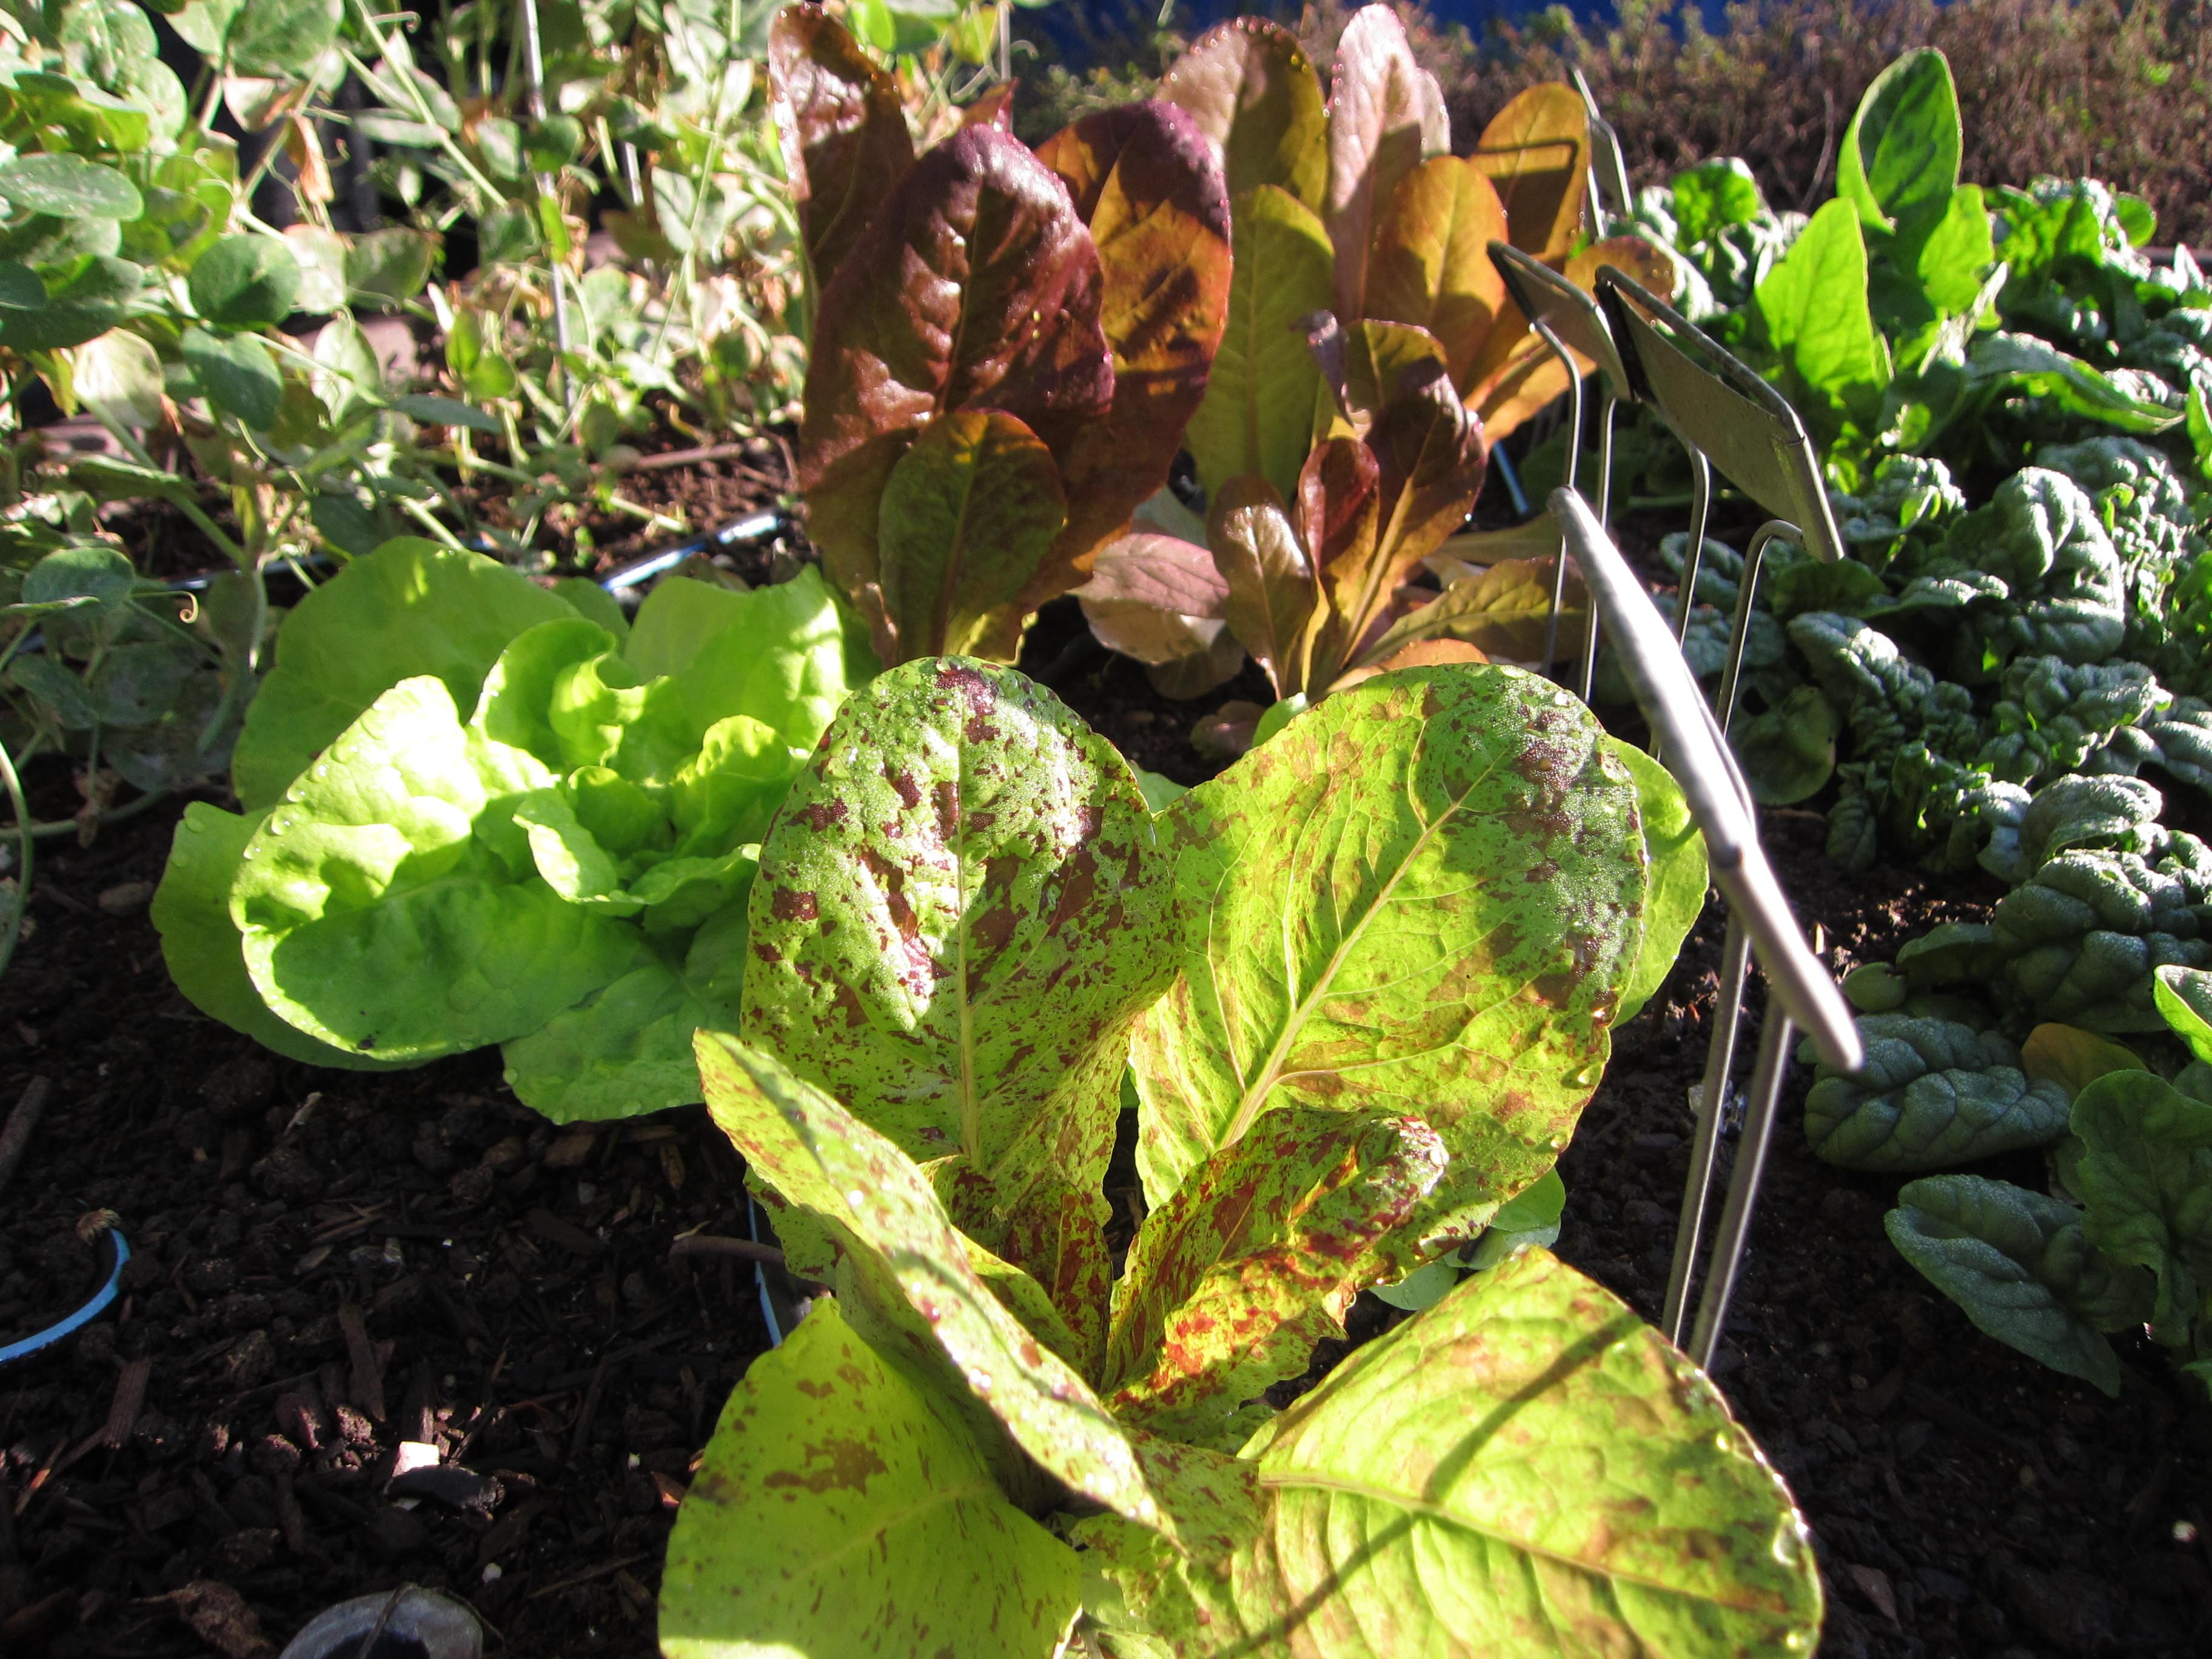 Forellenschluss, Kwiek, 4 Seasons lettuces drink up the sun.